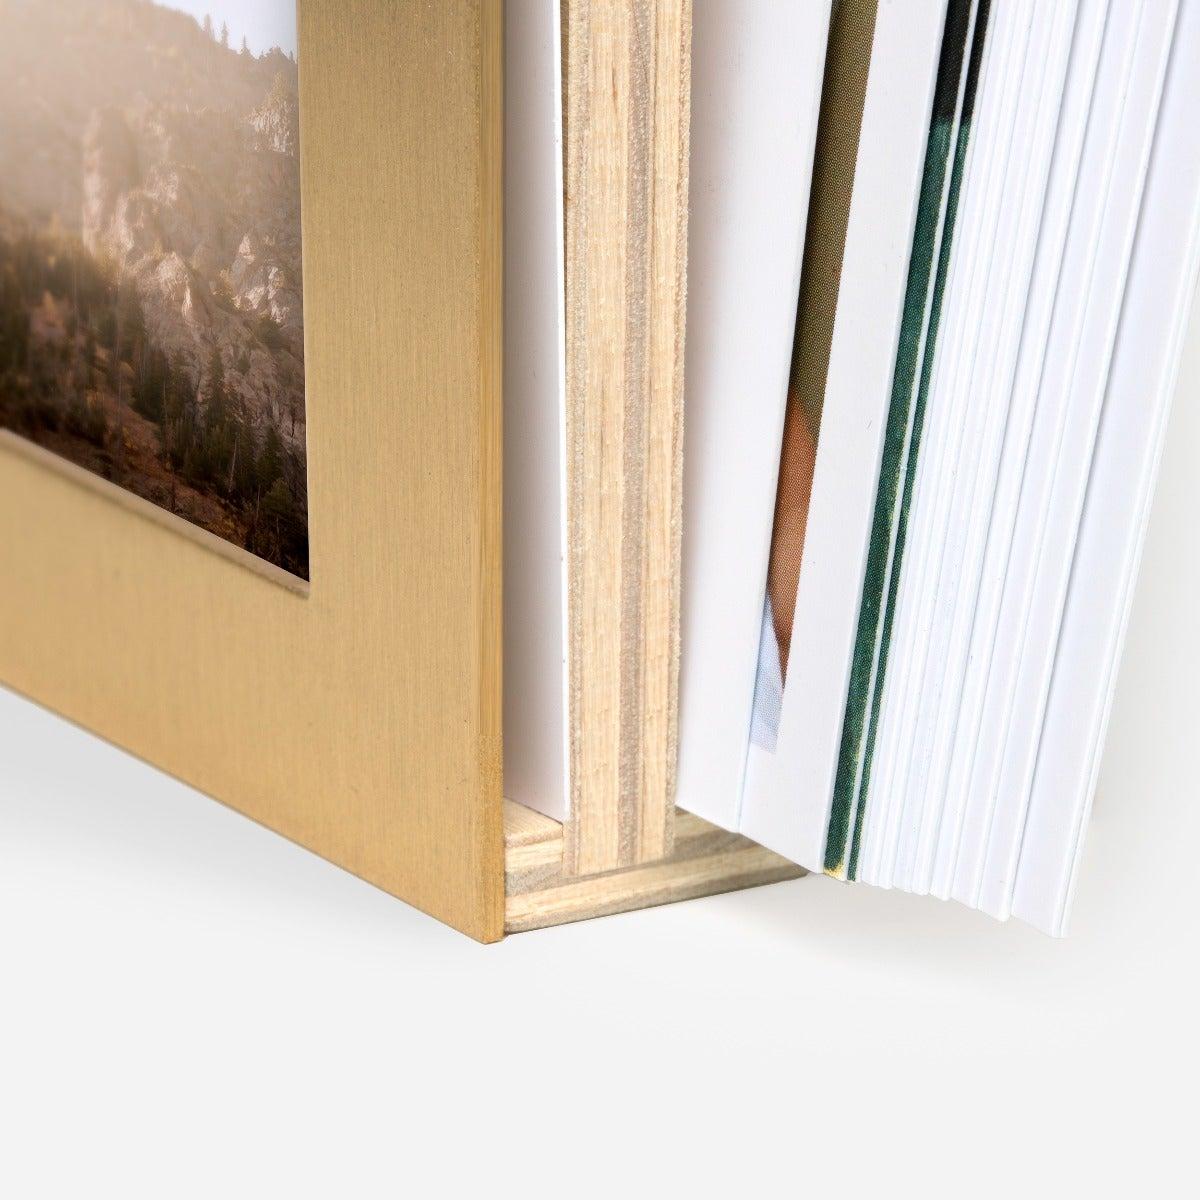 Brass & Wood Display Box